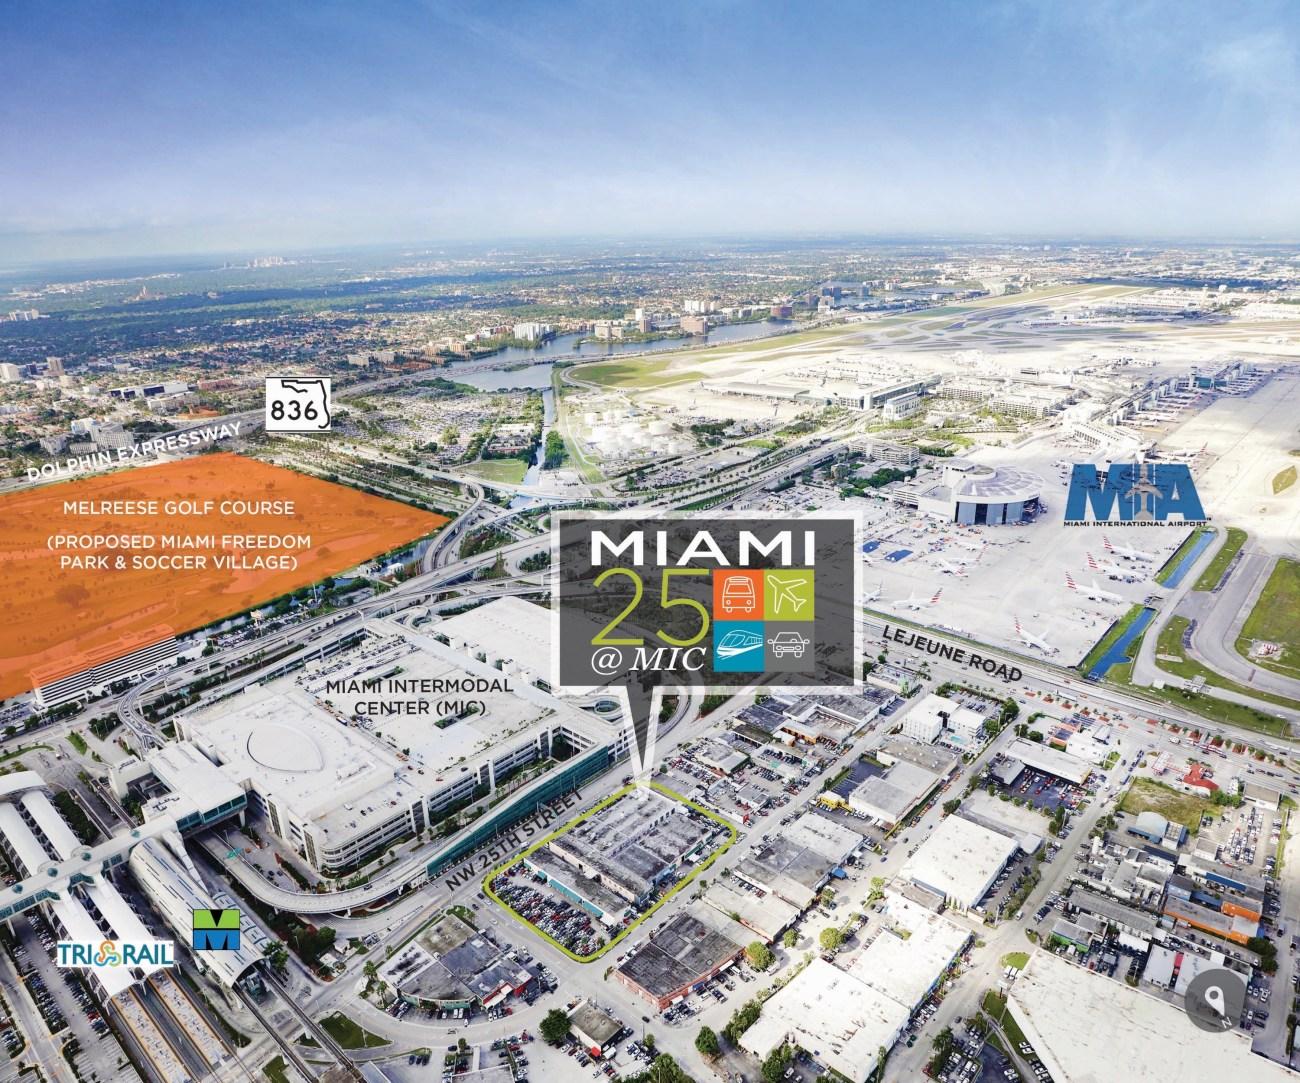 Cushman & Wakefield Negotiates $8.55M Sale of Miami 25 @ MIC